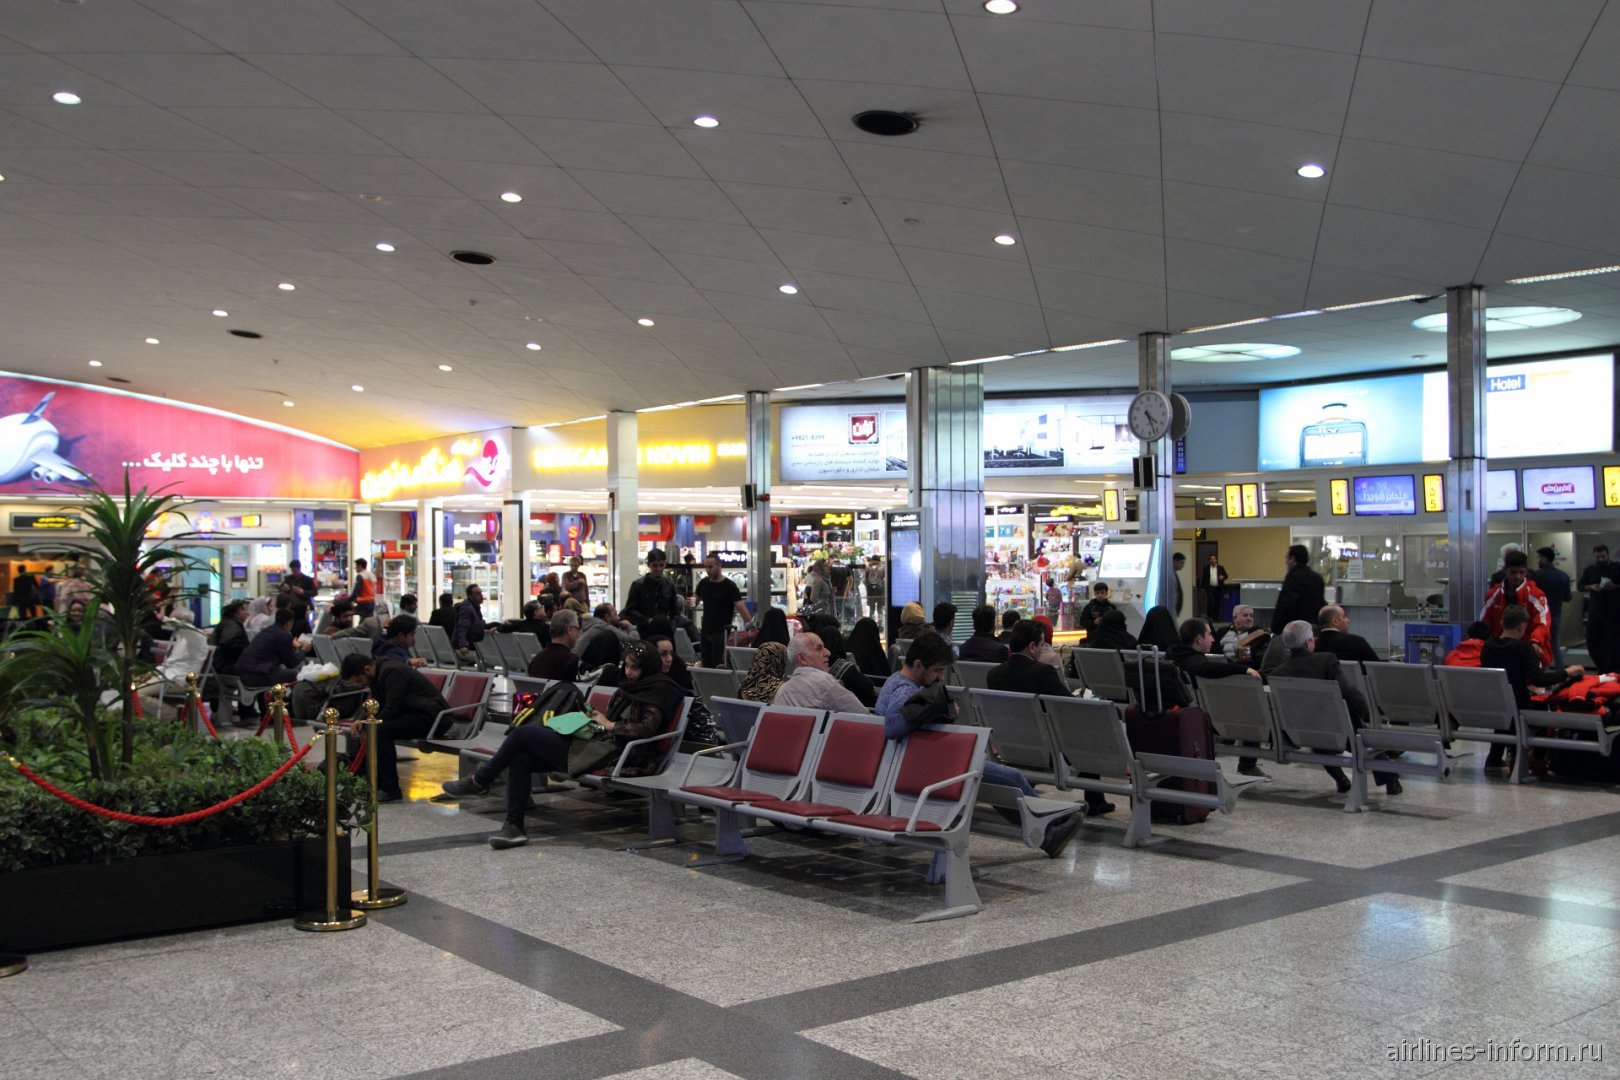 Общий зал терминала 4 аэропорта Тегеран Мехрабад